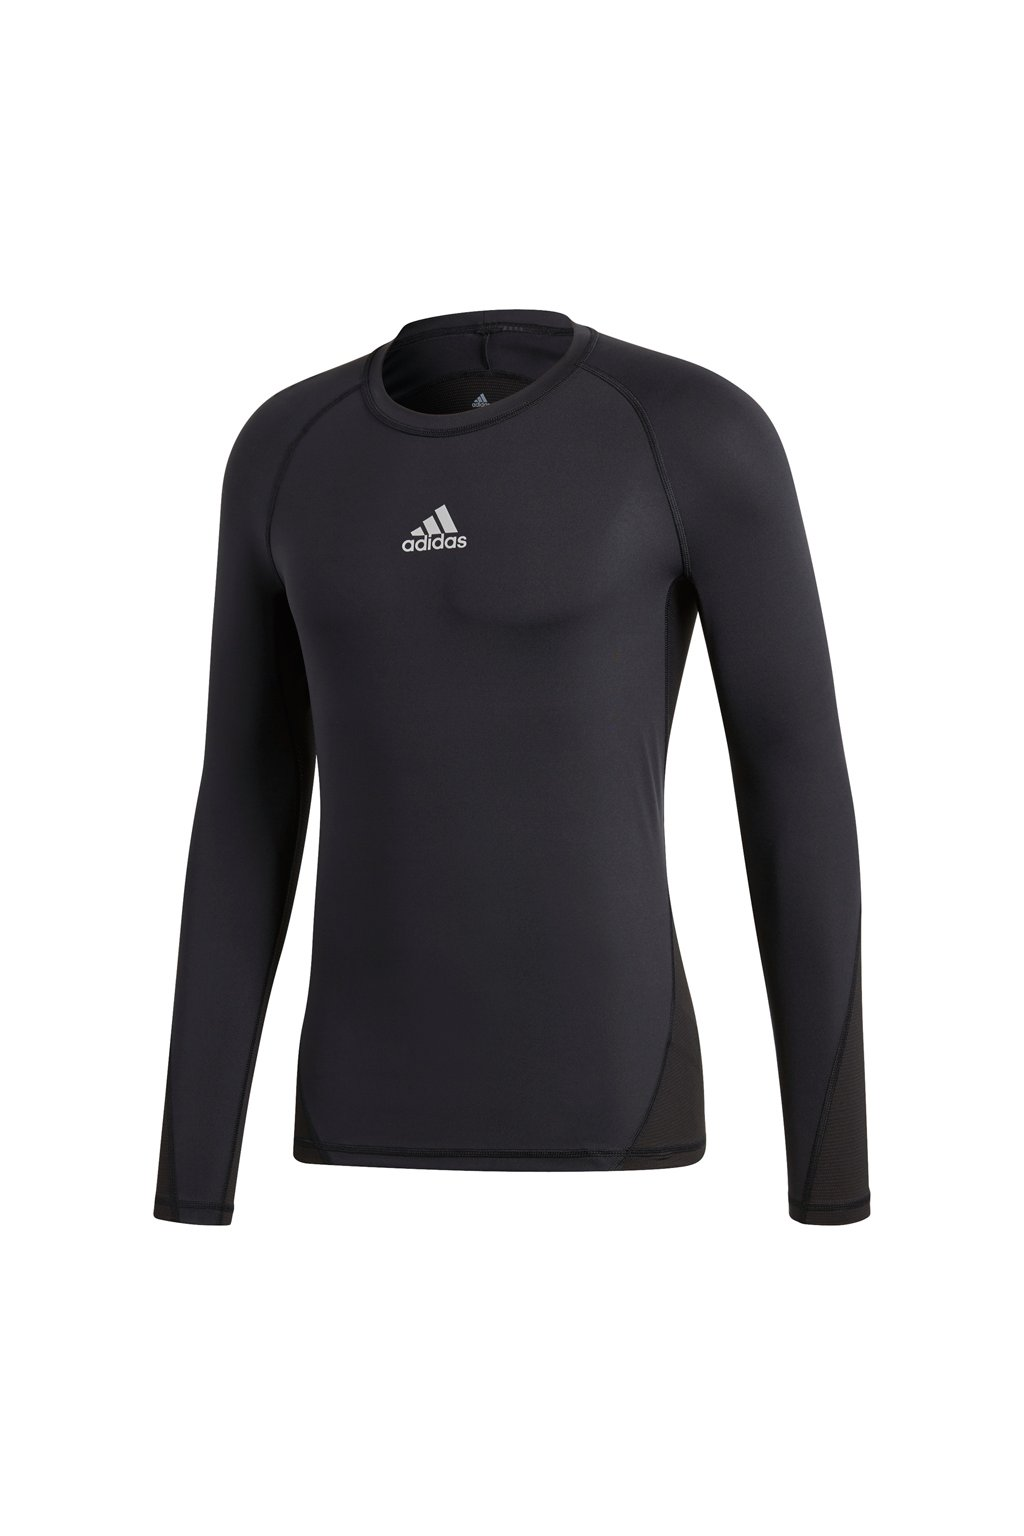 Pánske tričko Adidas Alphaskin Sport LS Tee black CW9486